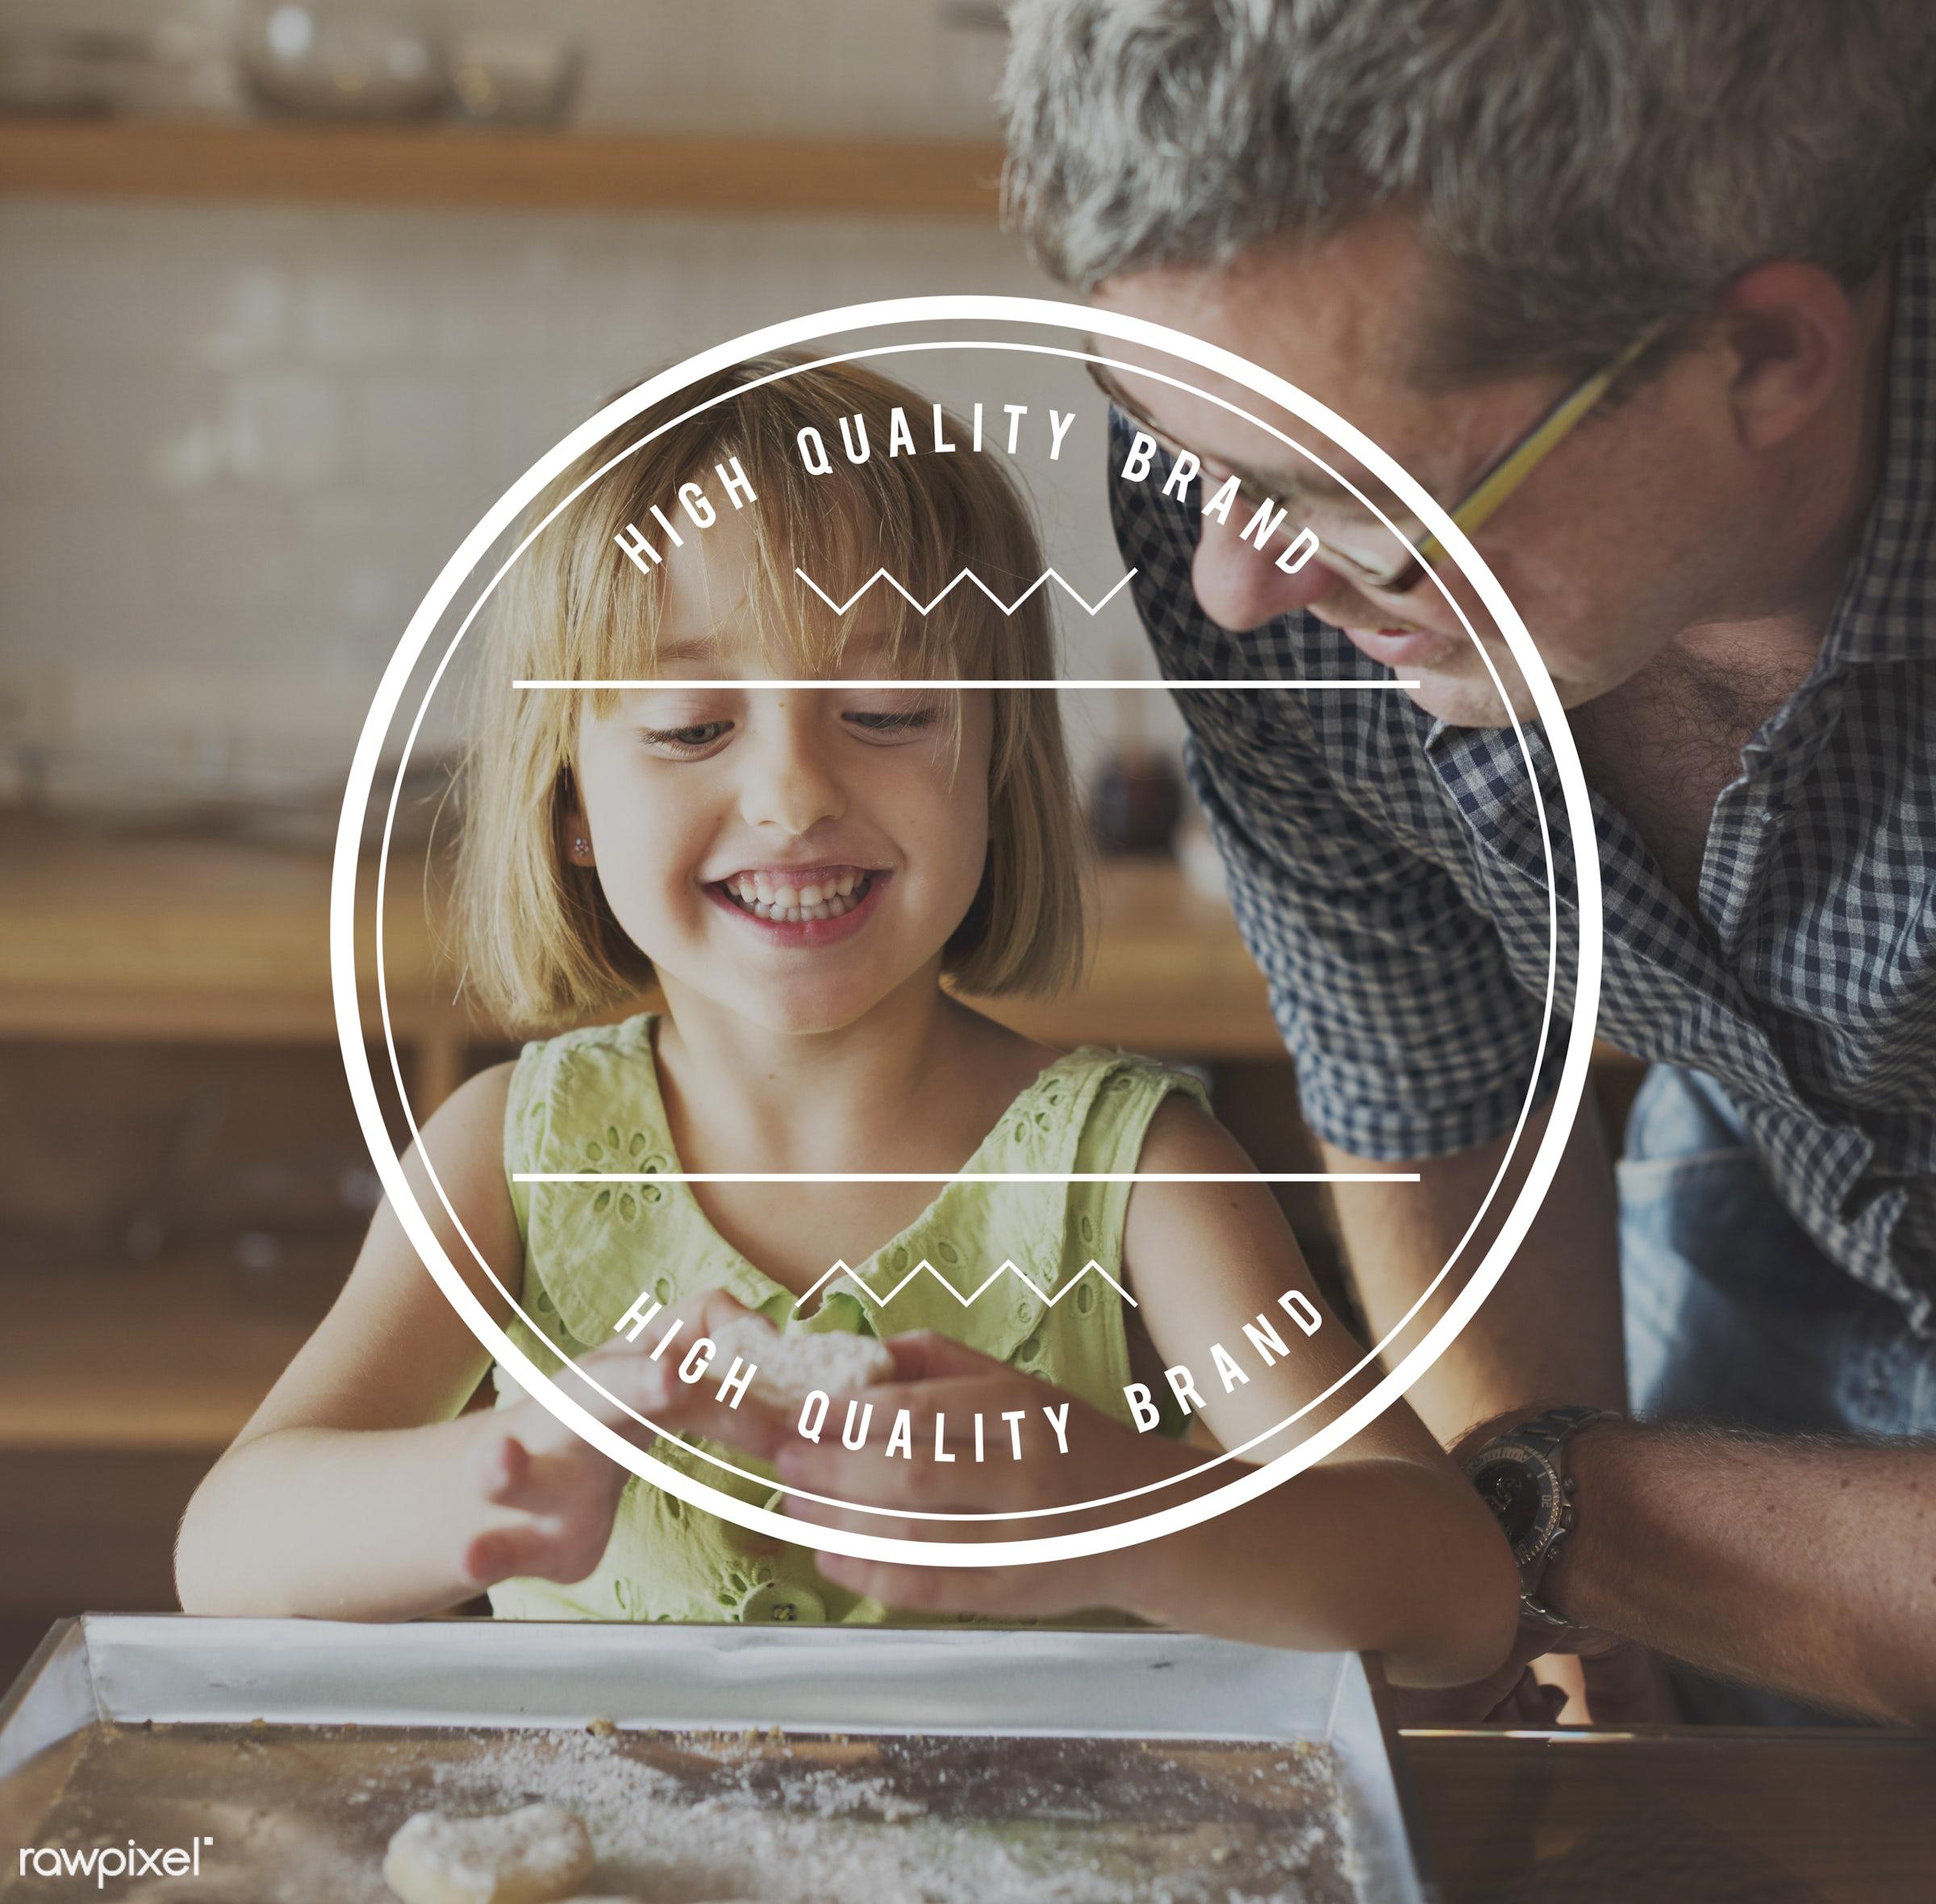 elegance, bake, baking, best, bonding, cheerful, childhood, class, condition, cookies, cute, enjoy, enjoyment, excellence,...